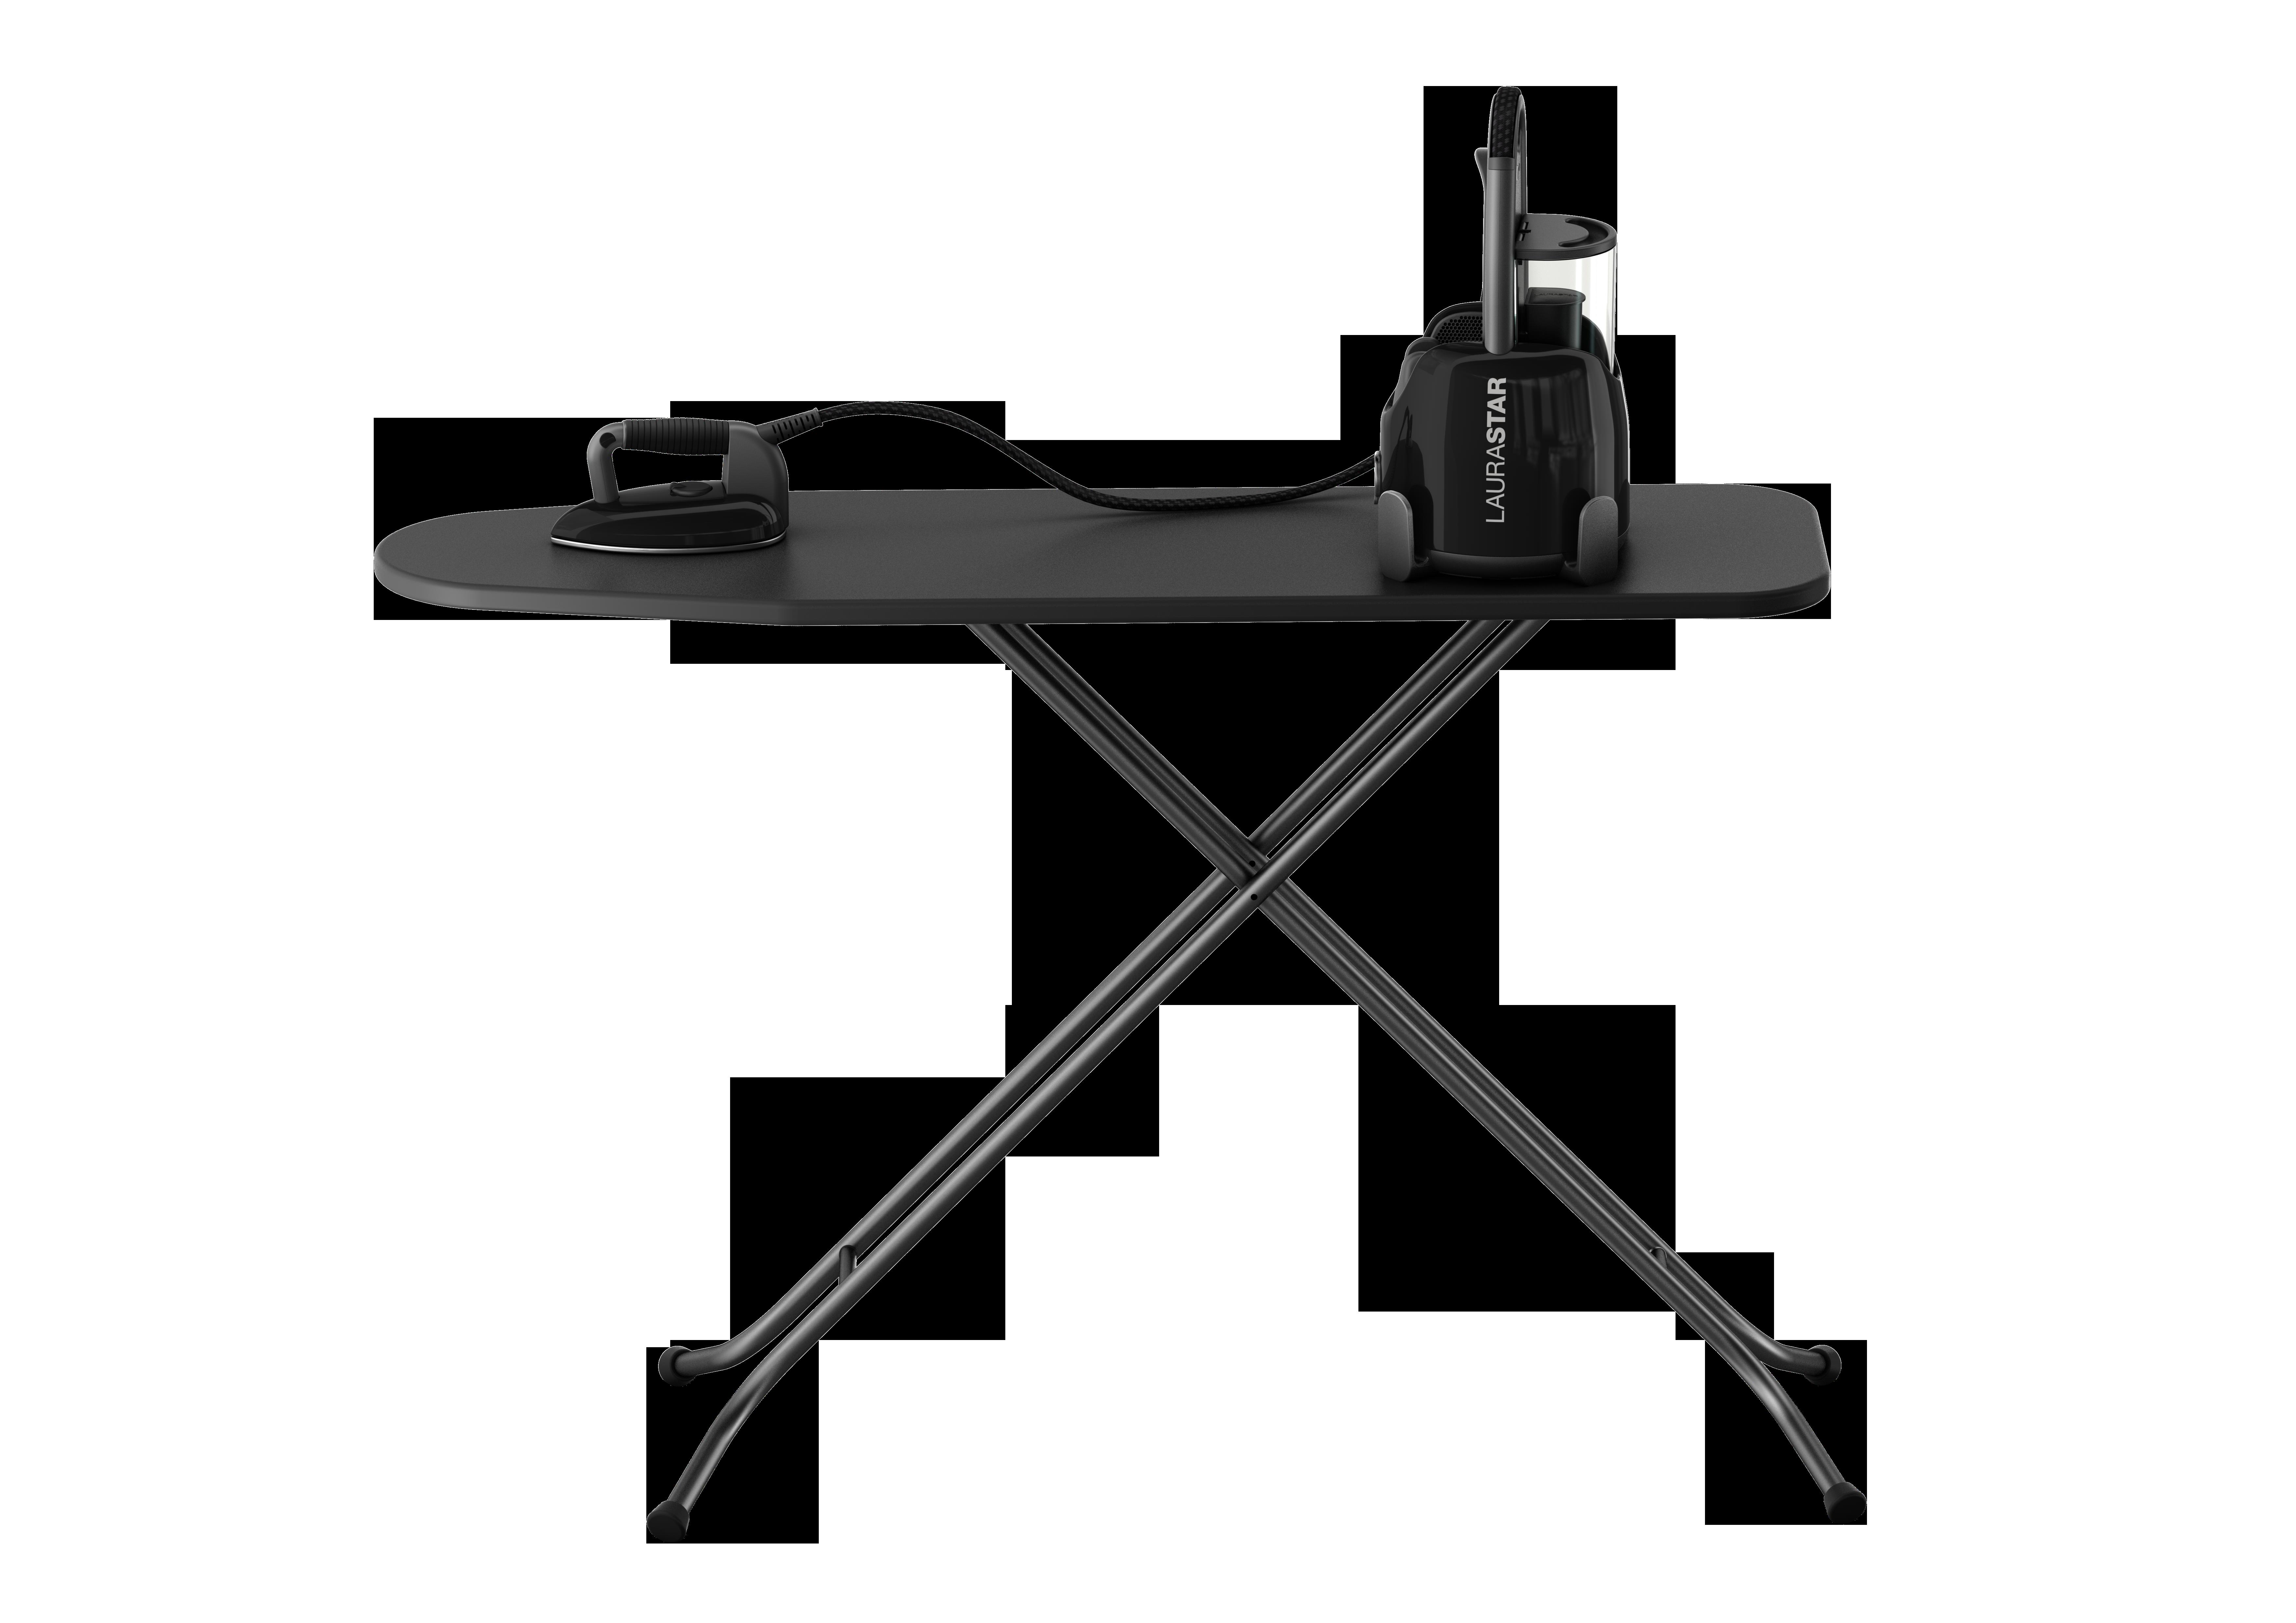 laurastar lift ultimate black tragbare b gelstation g nstig bei ww versand de bestellen. Black Bedroom Furniture Sets. Home Design Ideas